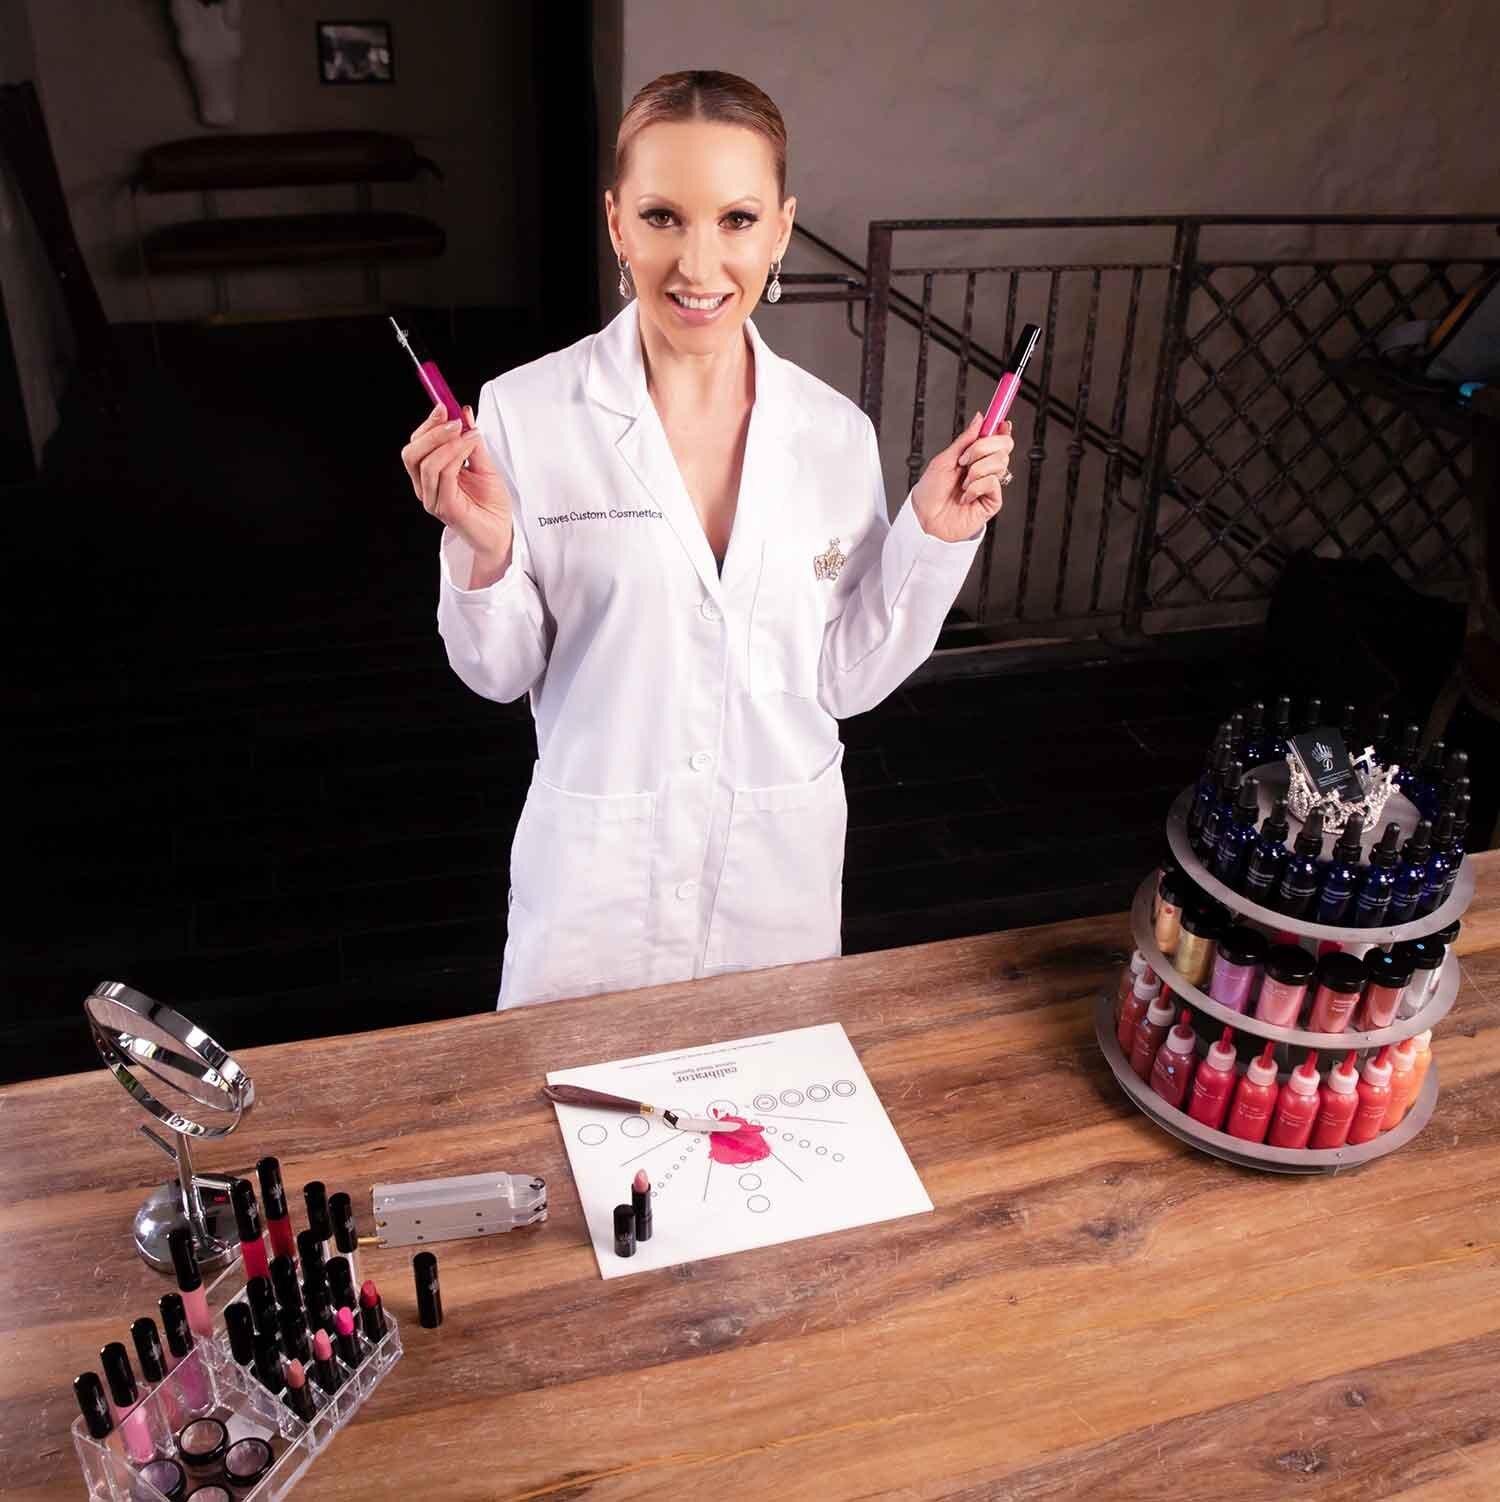 Woman lab coat making lipstick with beauty gift set